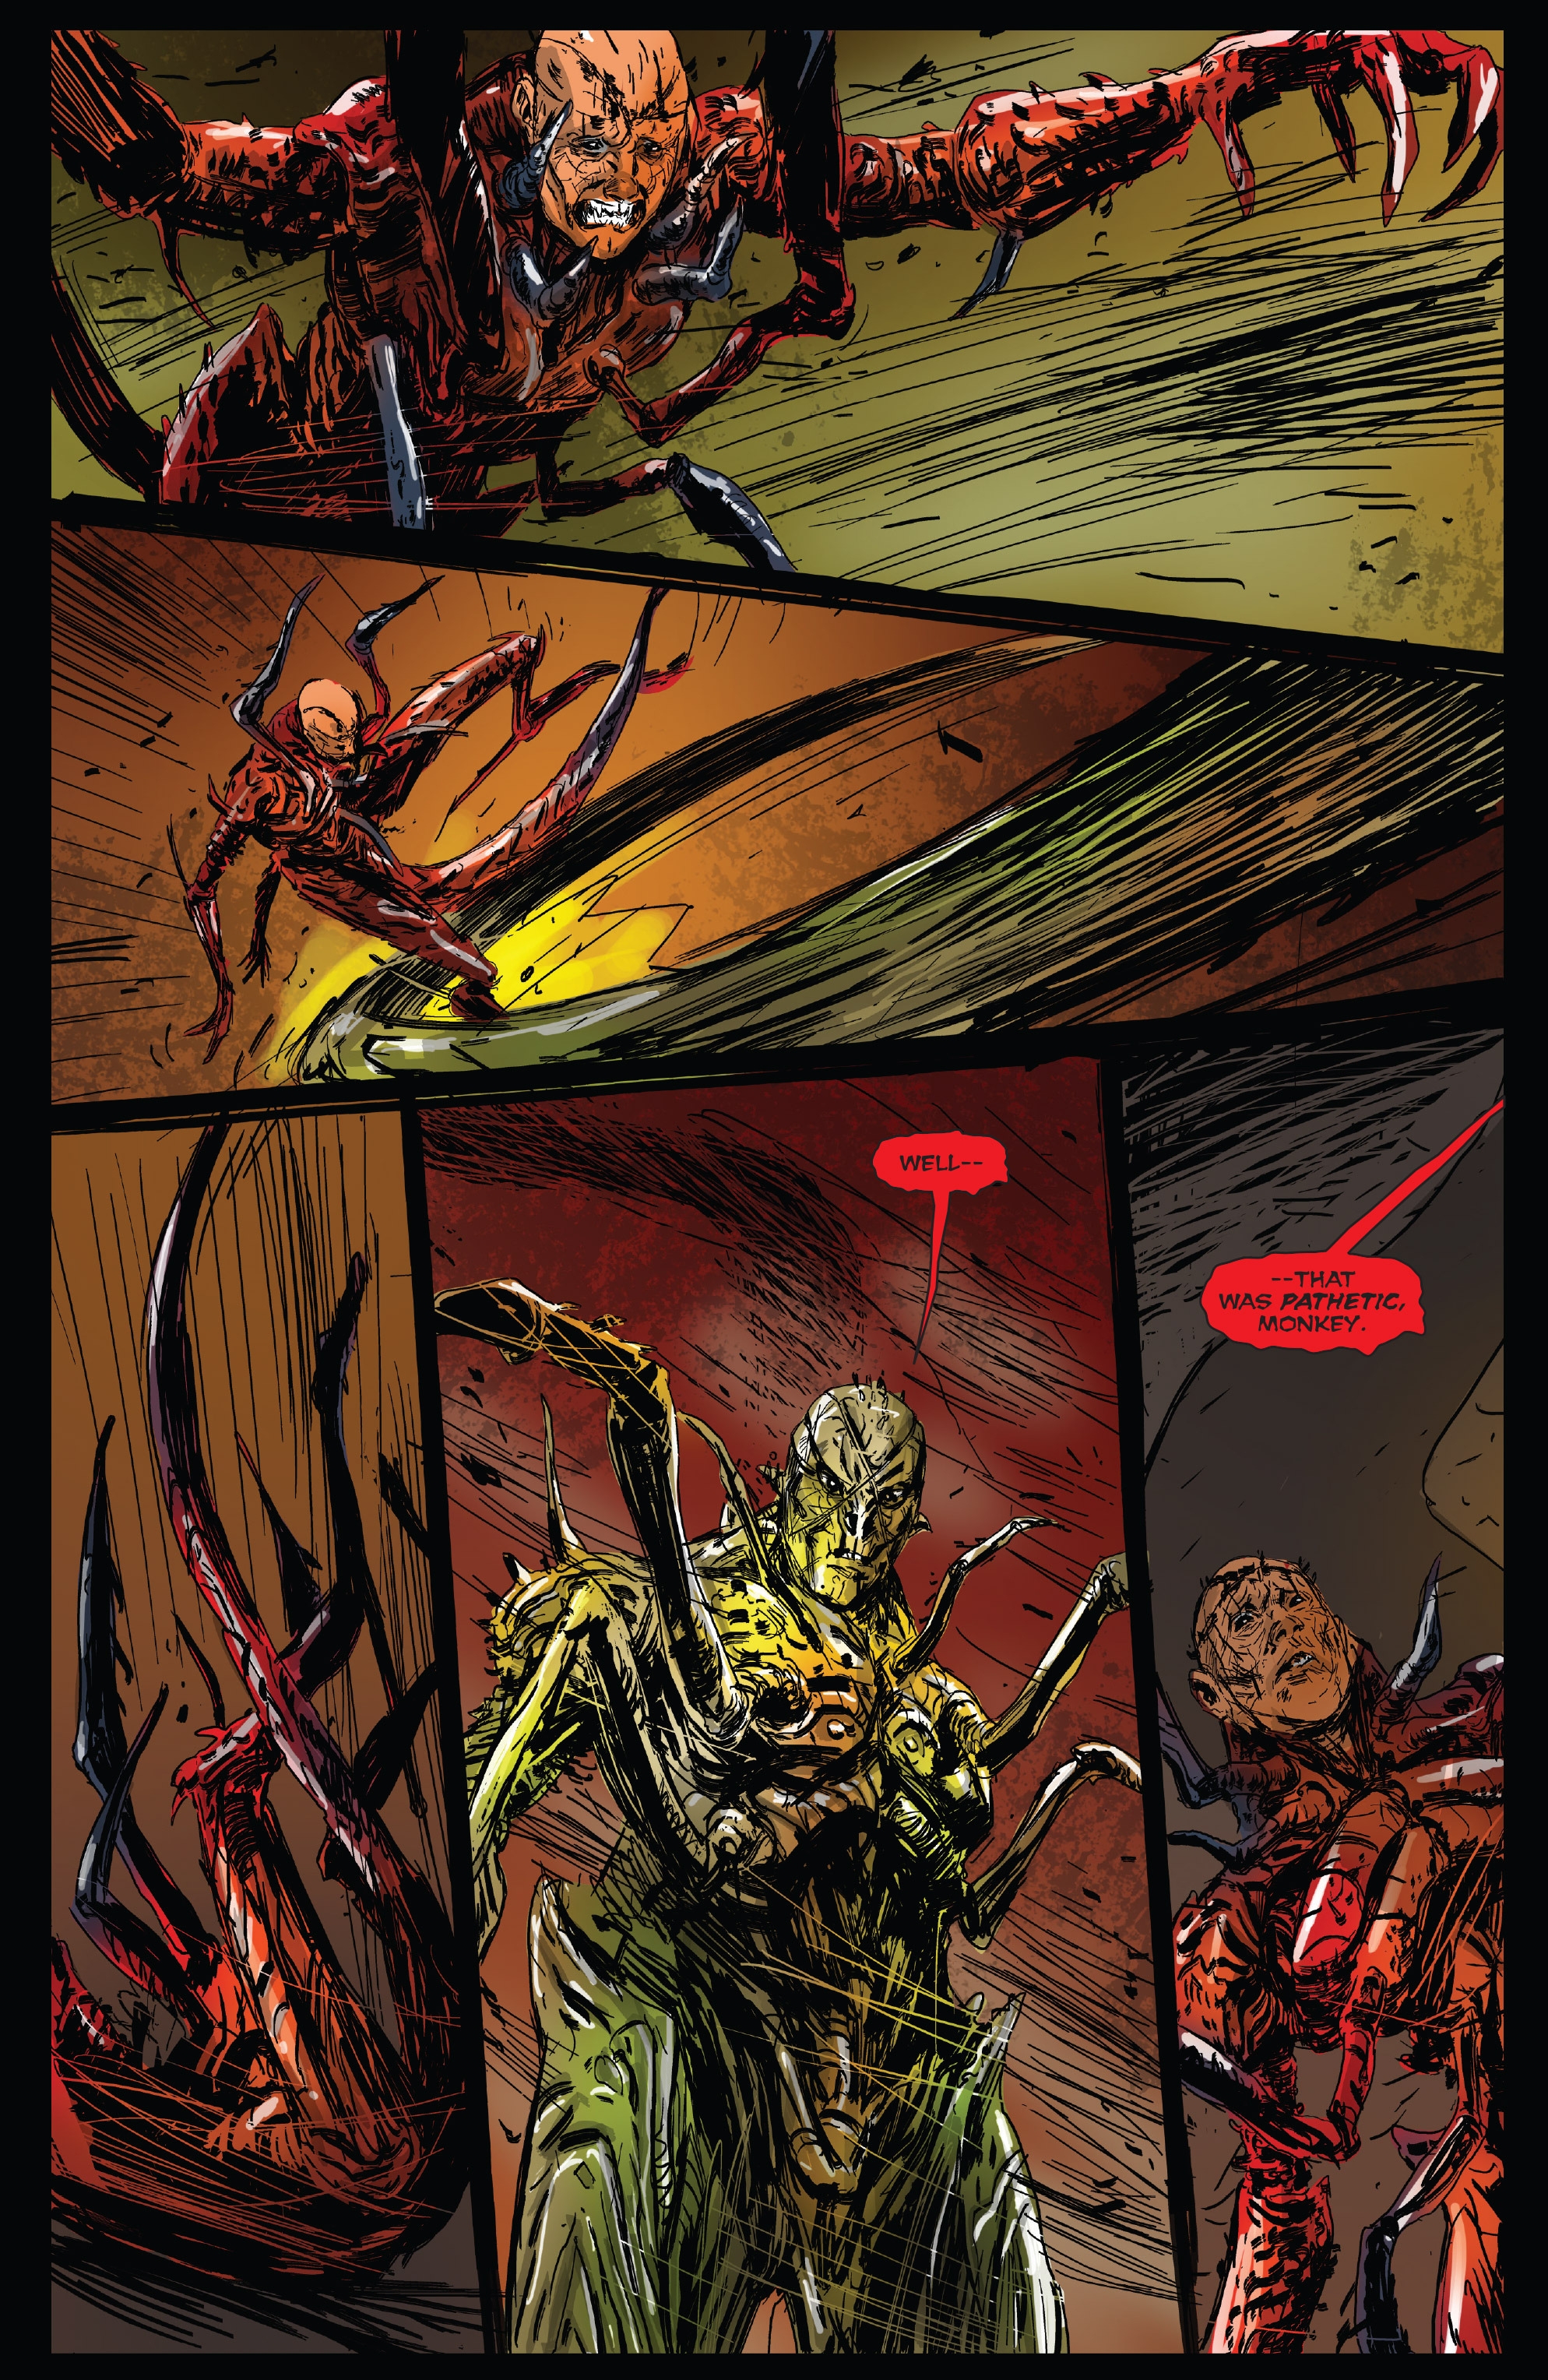 Read online Clive Barker's Hellraiser: The Dark Watch comic -  Issue # TPB 3 - 11